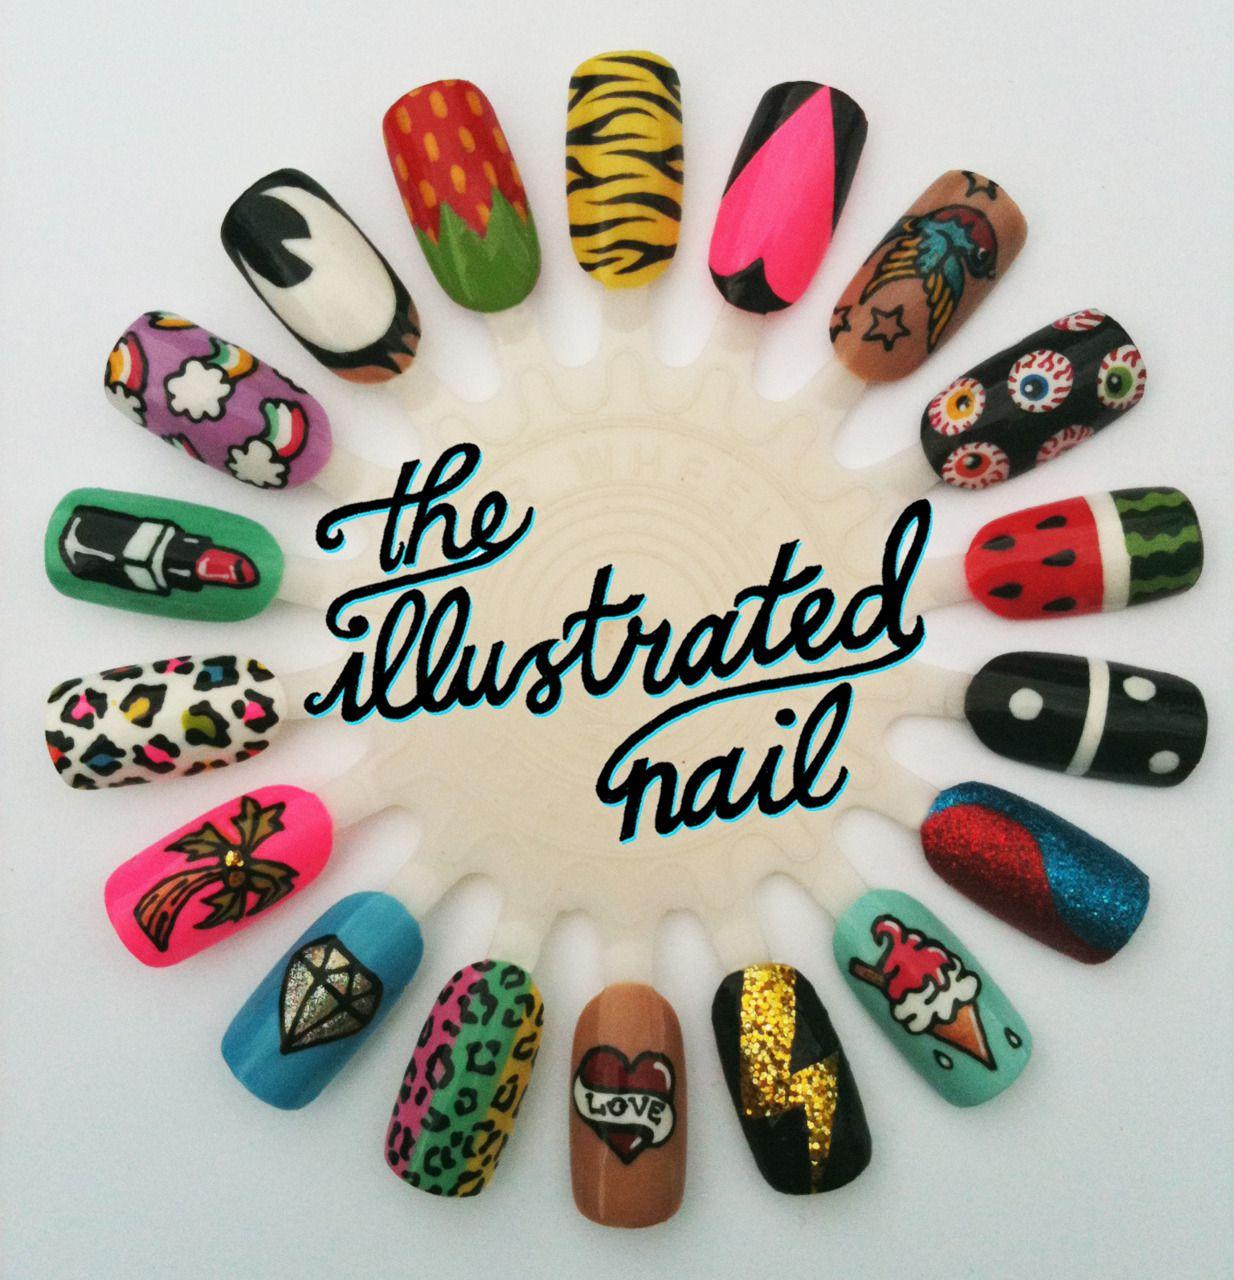 Nailarttumblr Nail Art 2013 Tumblr Joy Studio Design Gallery